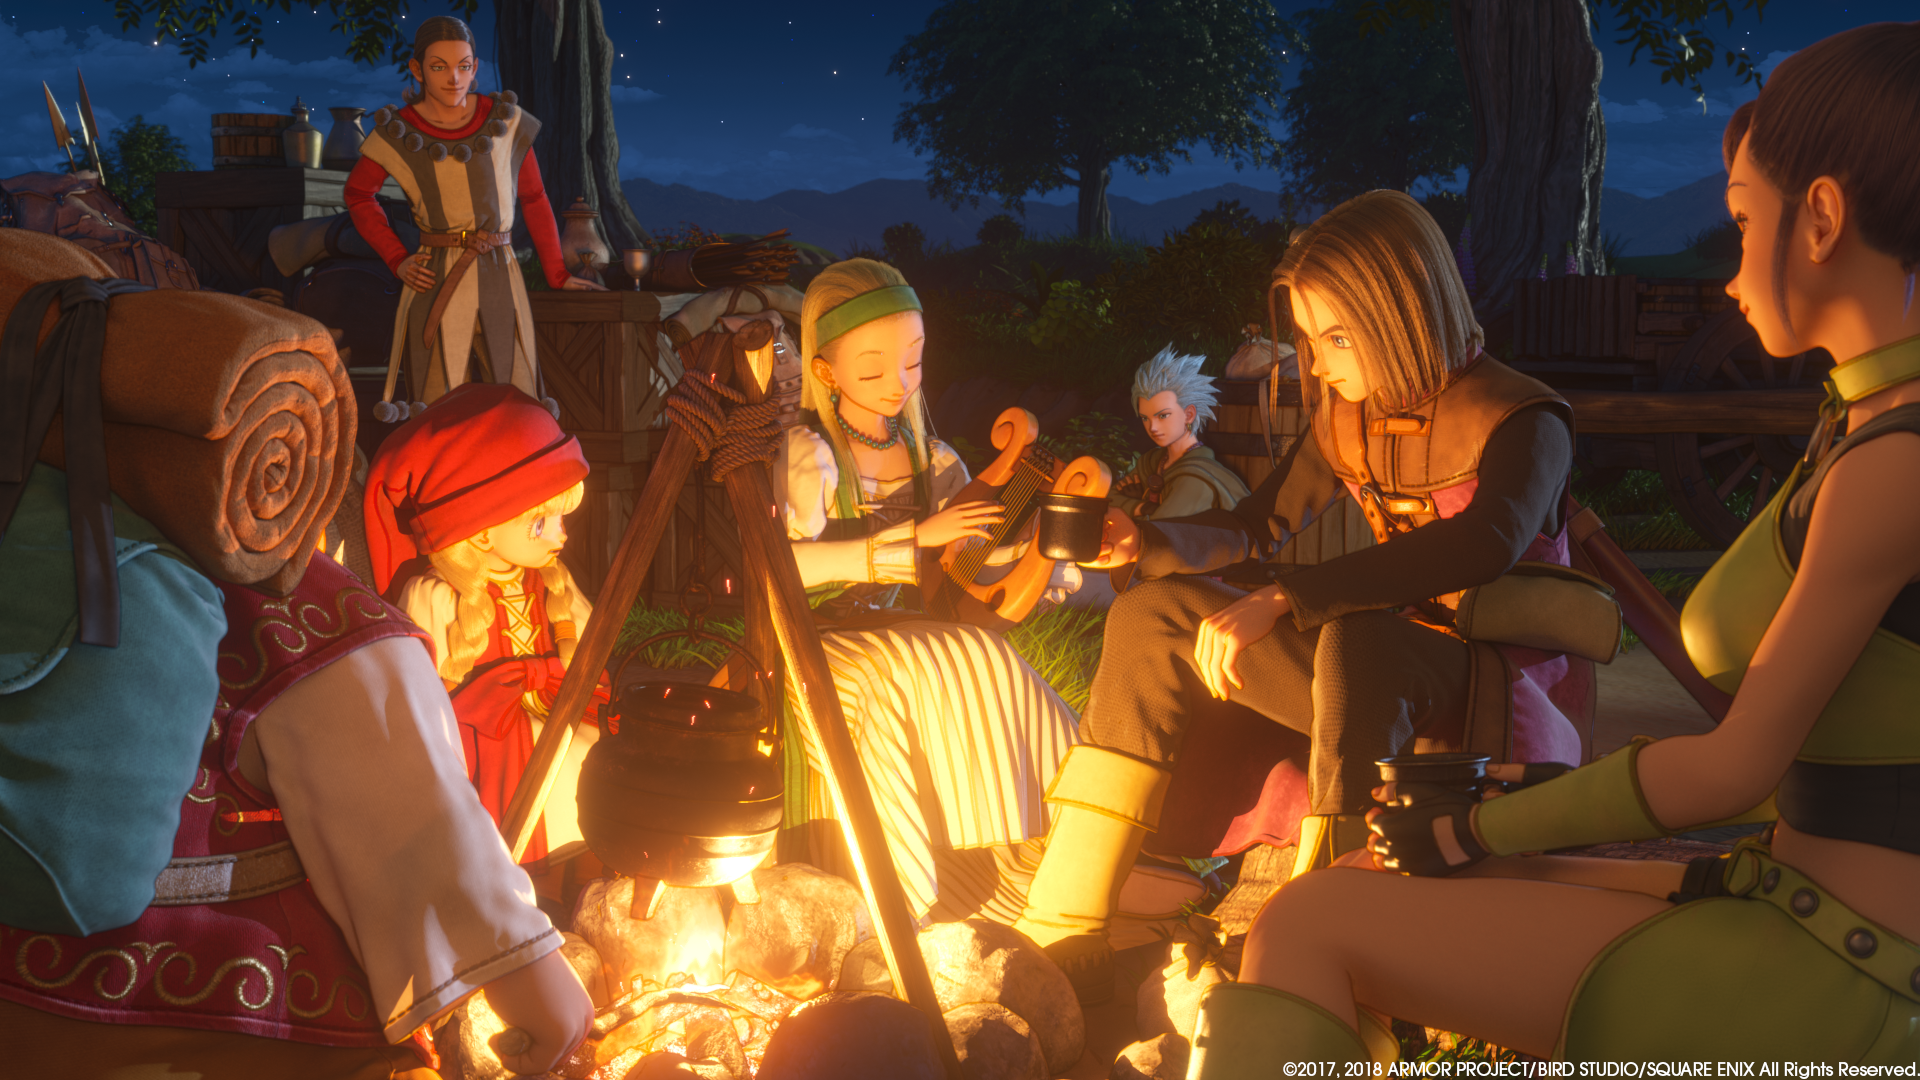 Dragon Quest XI DQ XI 11 Review Test Kritik PS4 PlayStation 4 PC JRPG Rollenspiel Titel